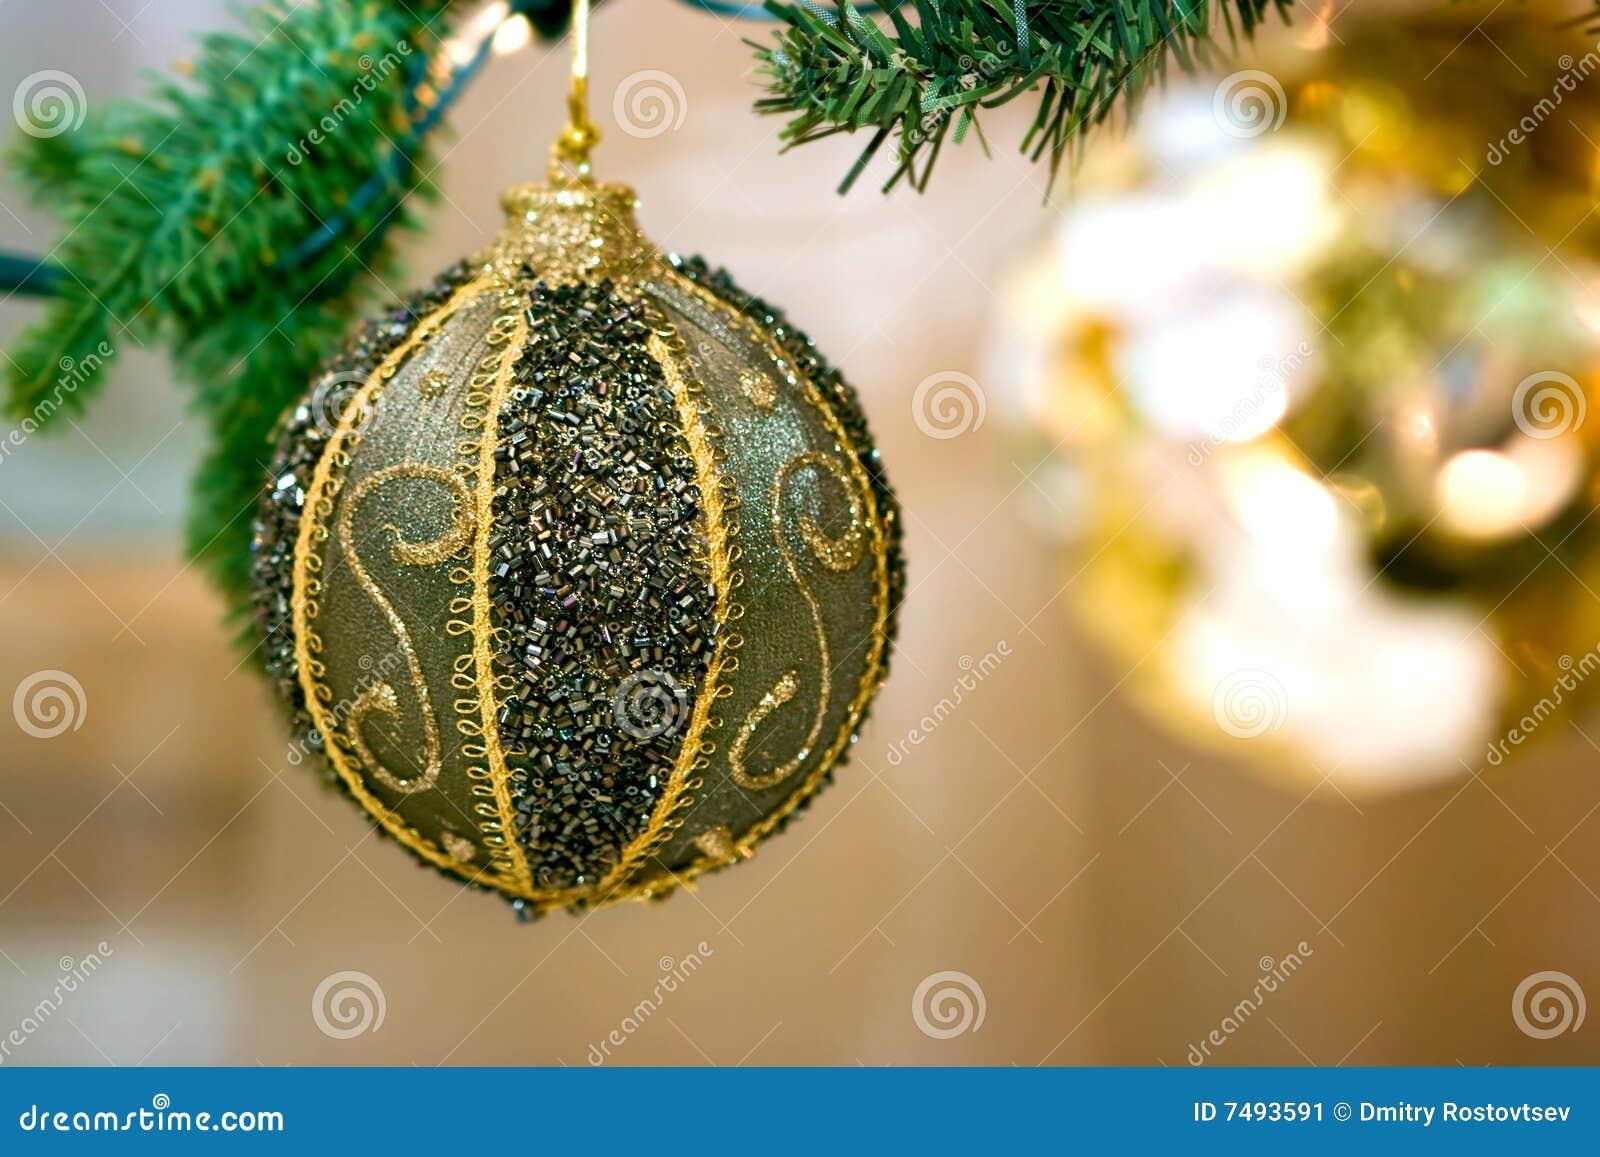 Christmas Tree Toys Handmade.Tree Toy Stock Image Image Of Ball Decorative Decoration